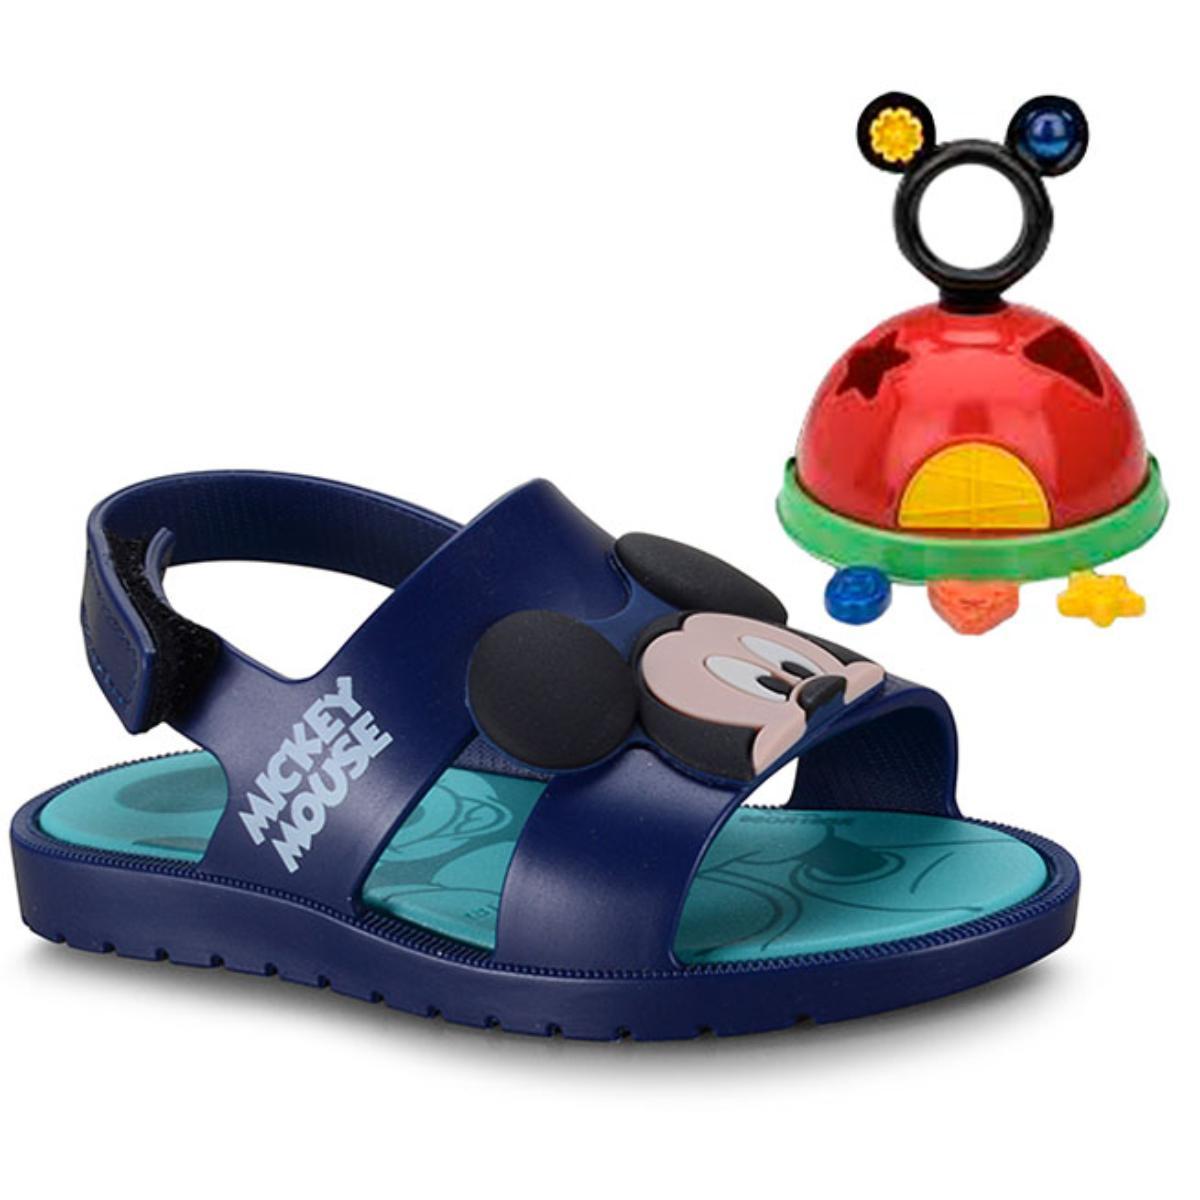 Sandália Masc Infantil Grendene 21996 24808 Mickey e Minnie Azul